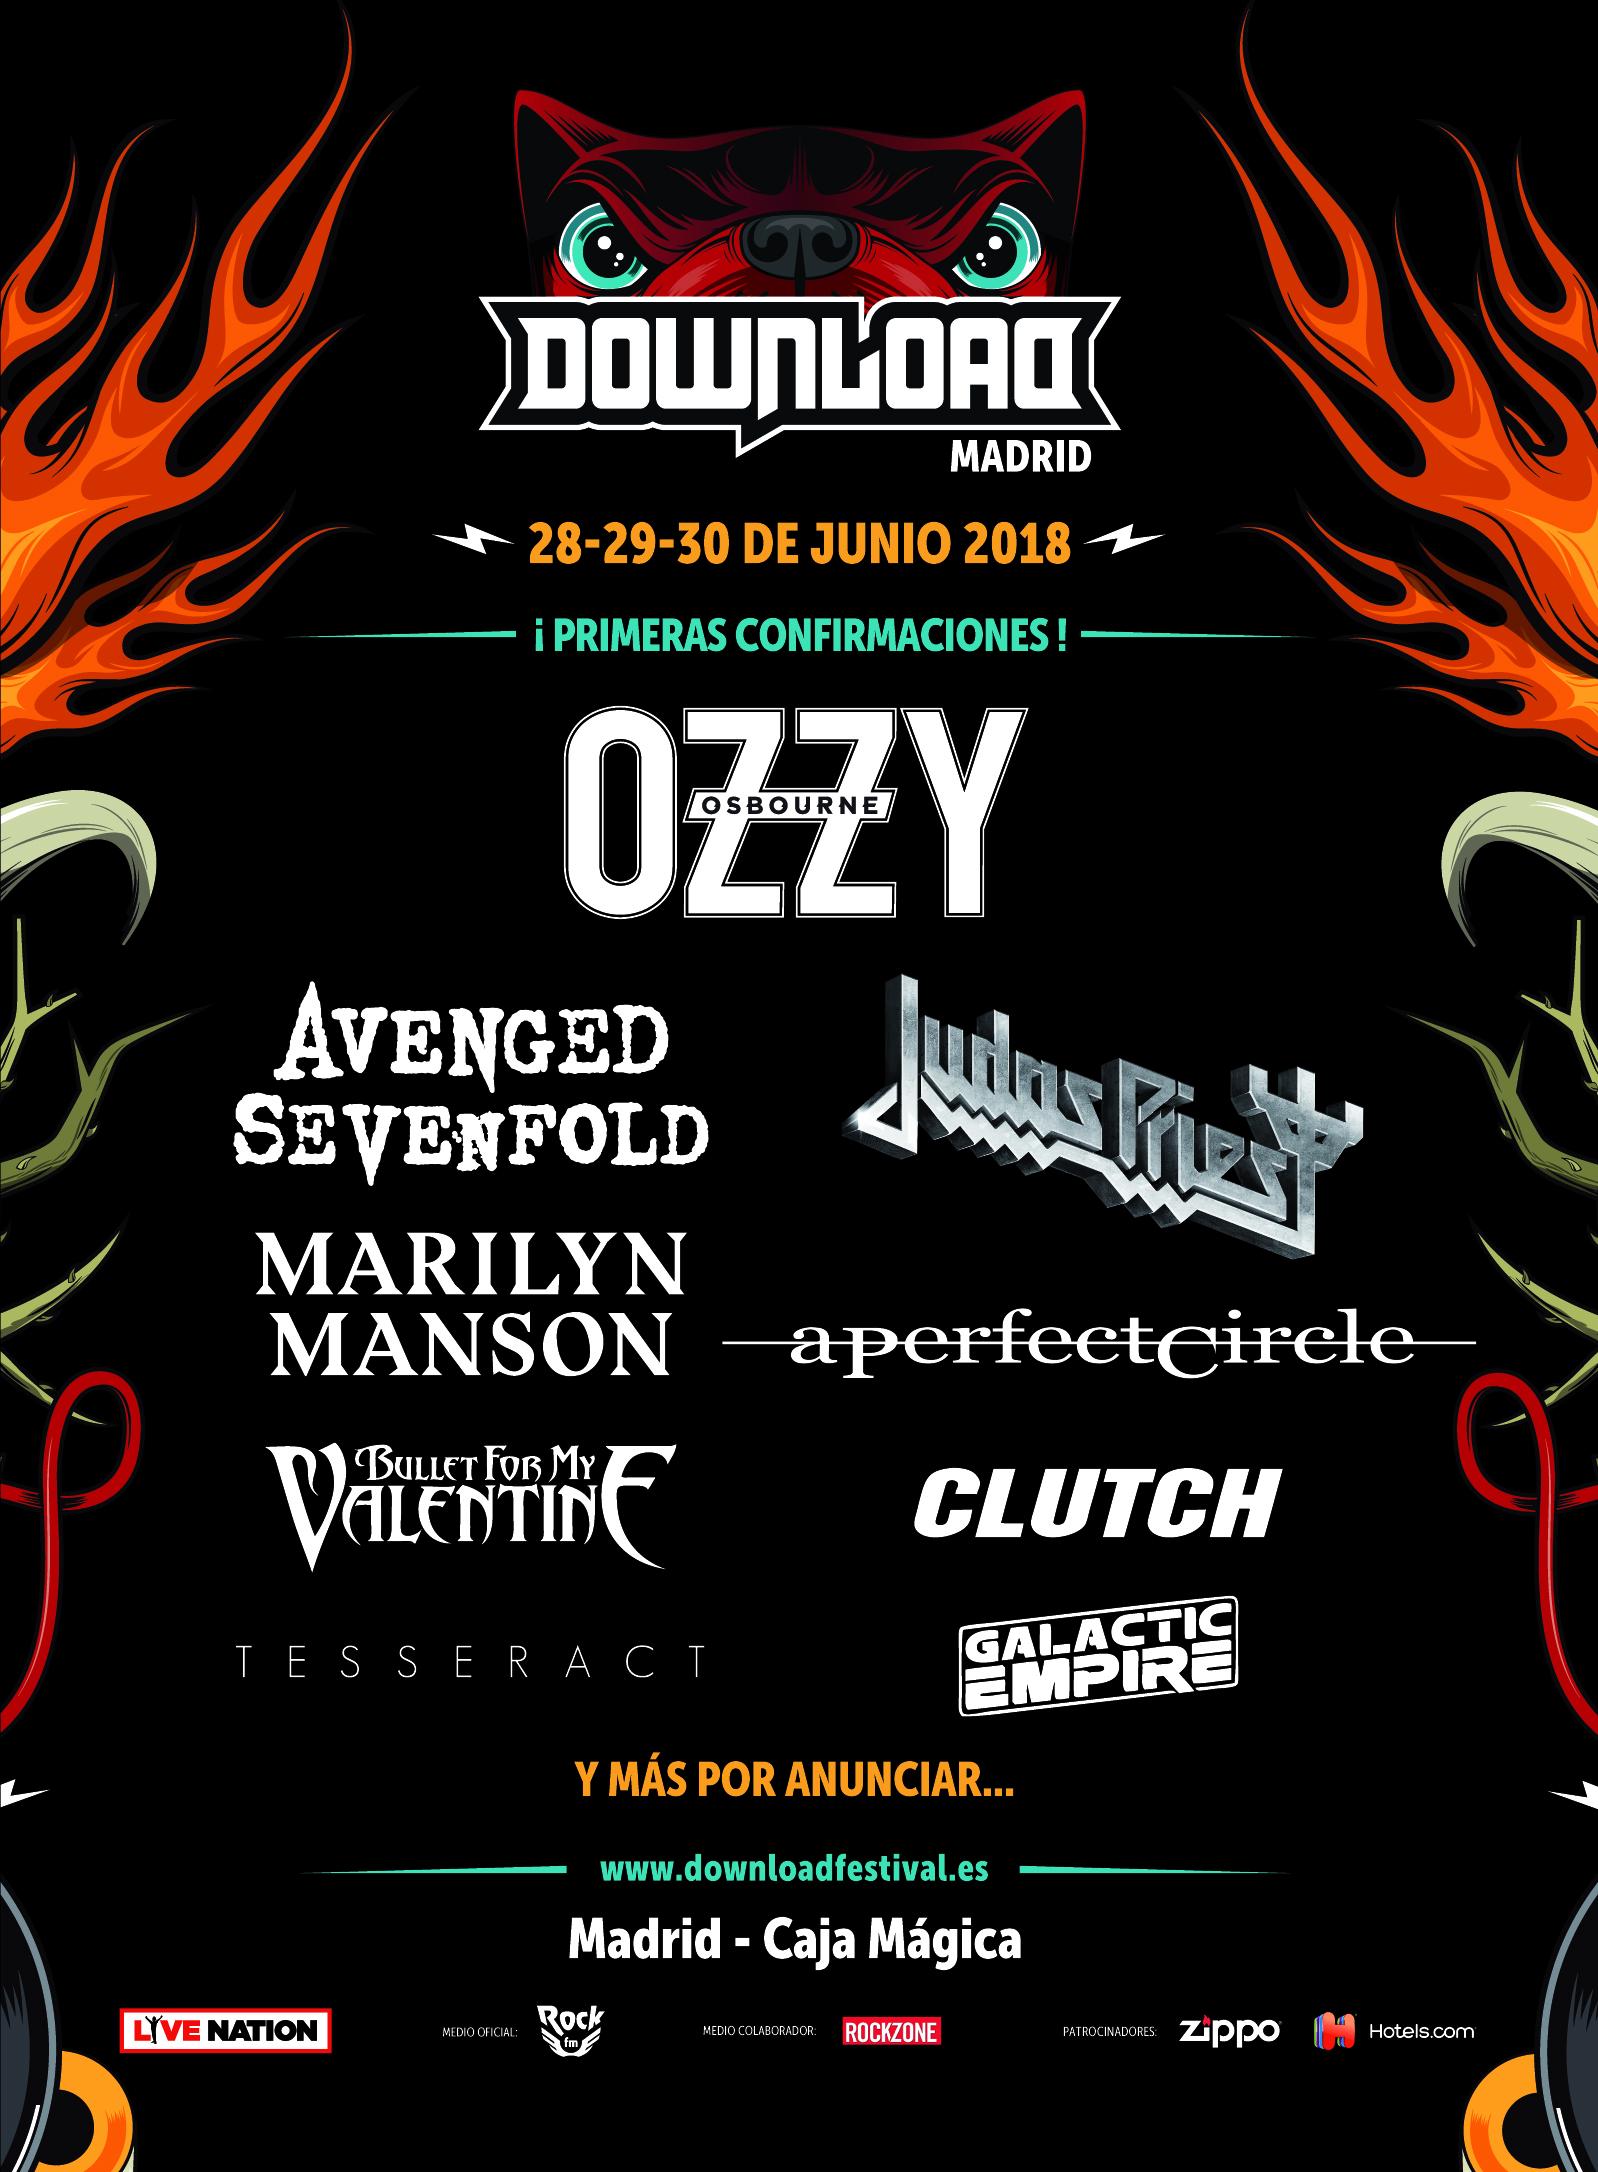 Download Festival Madrid 2018 1509993540